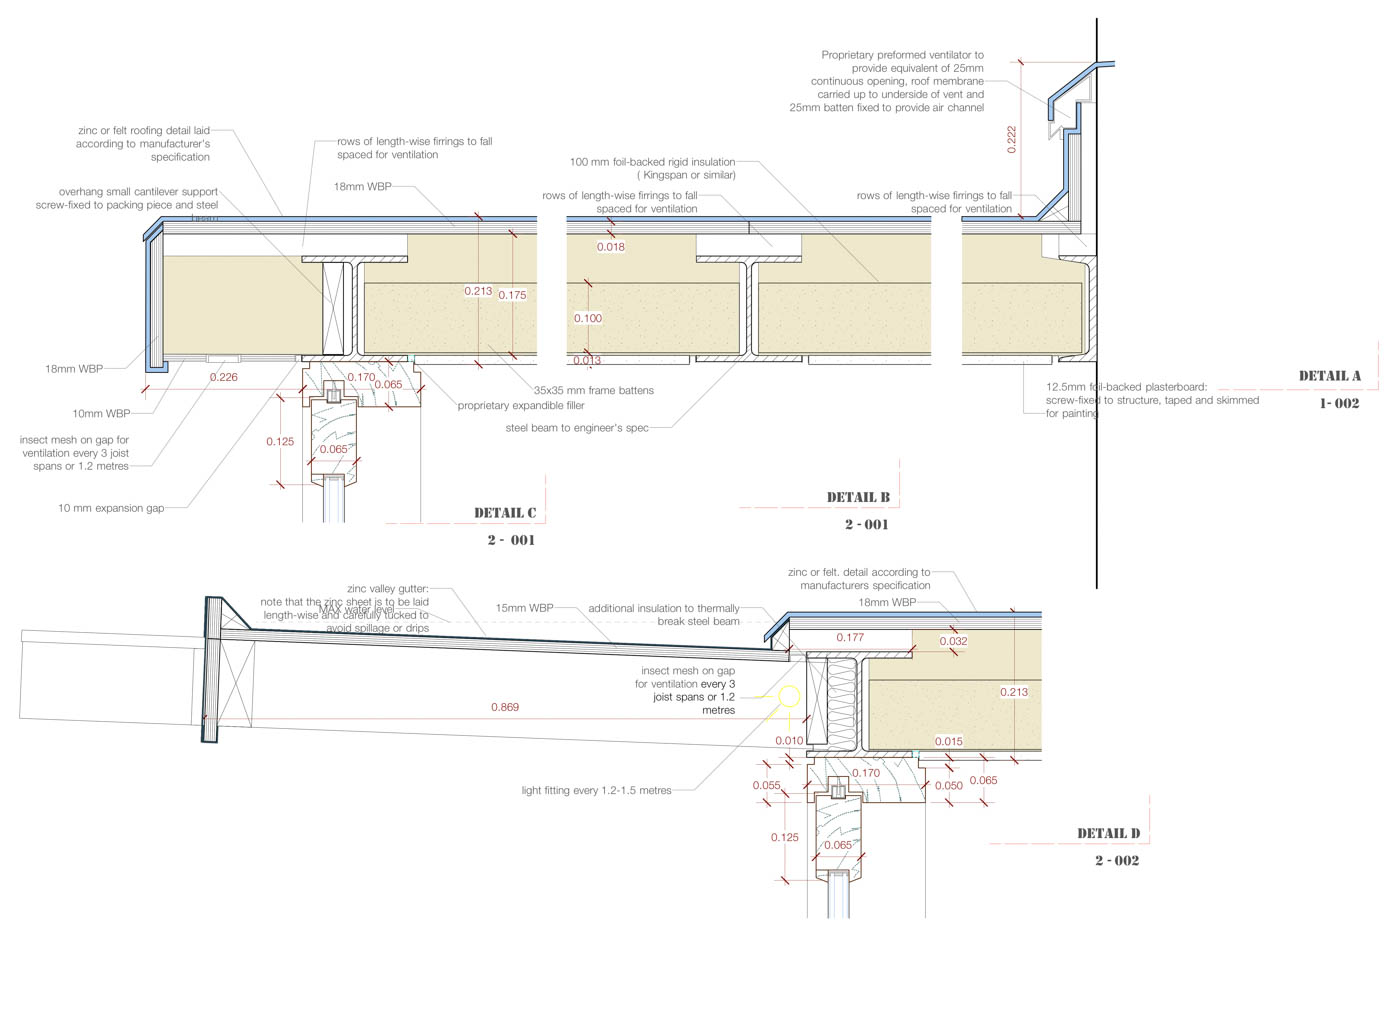 17-roof details 1